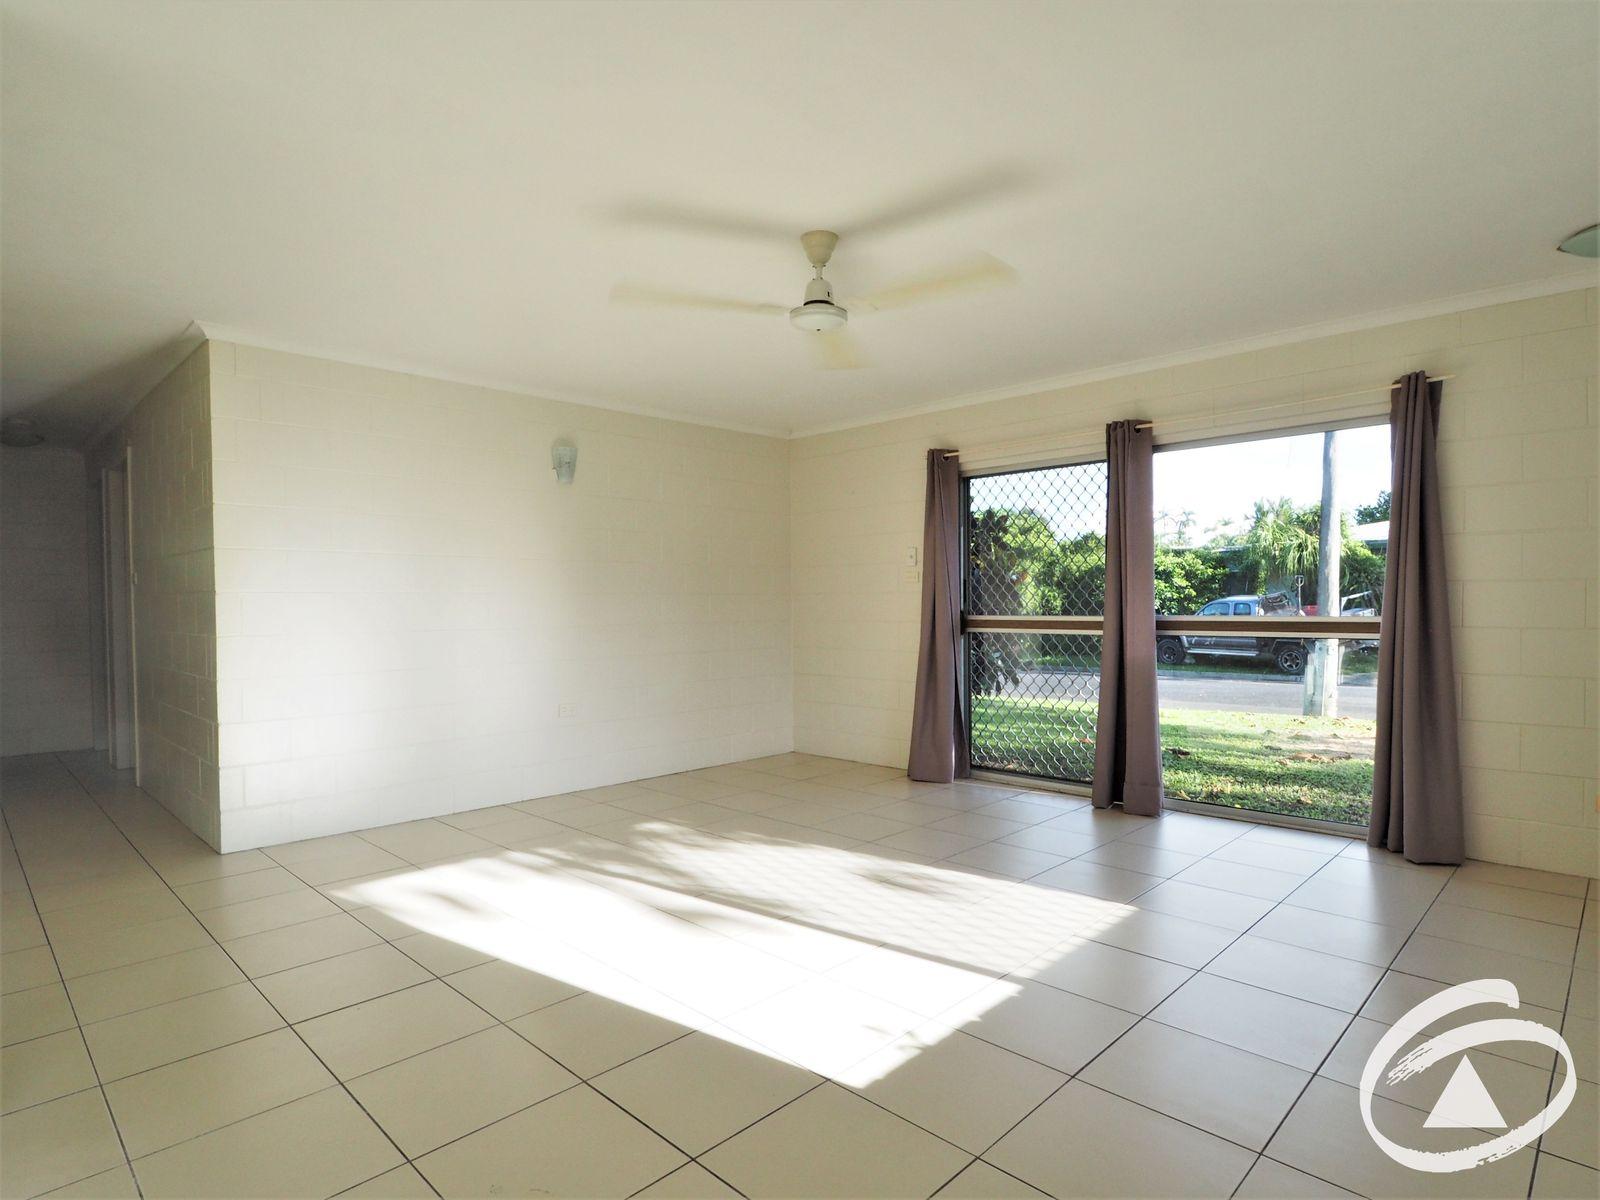 40 Kowinka Street, White Rock, QLD 4868